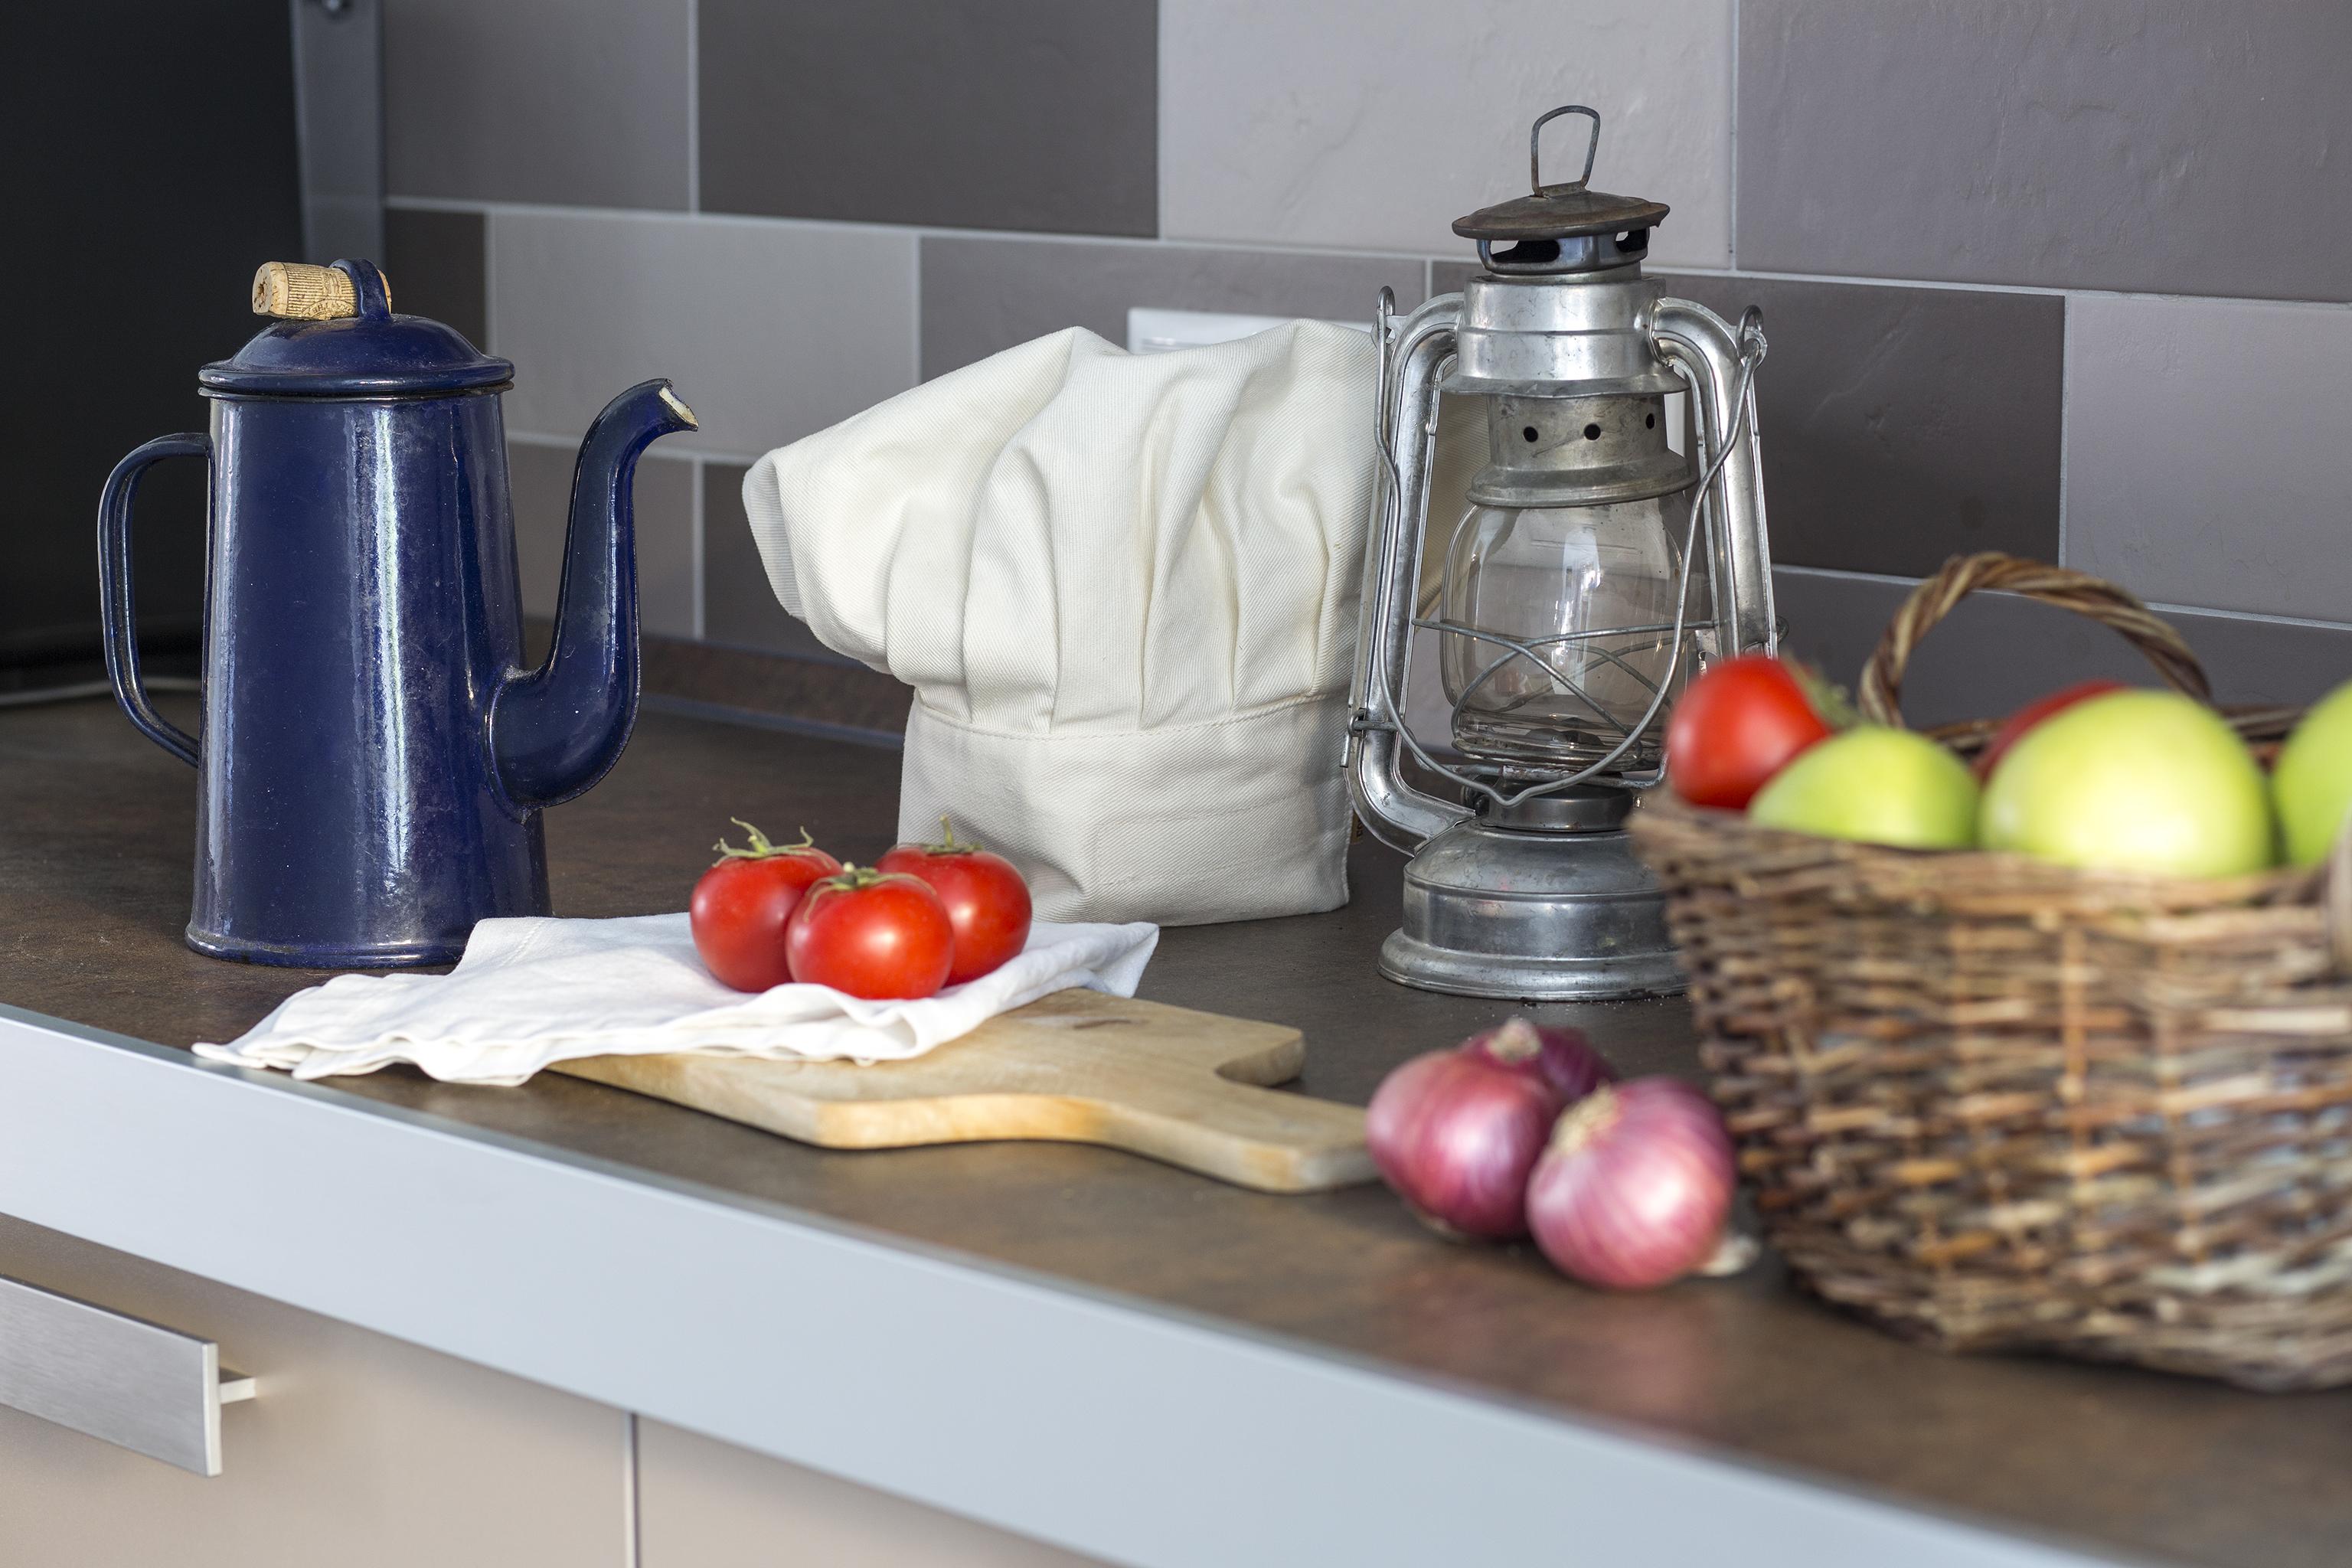 Кухонный уголок. Деталь